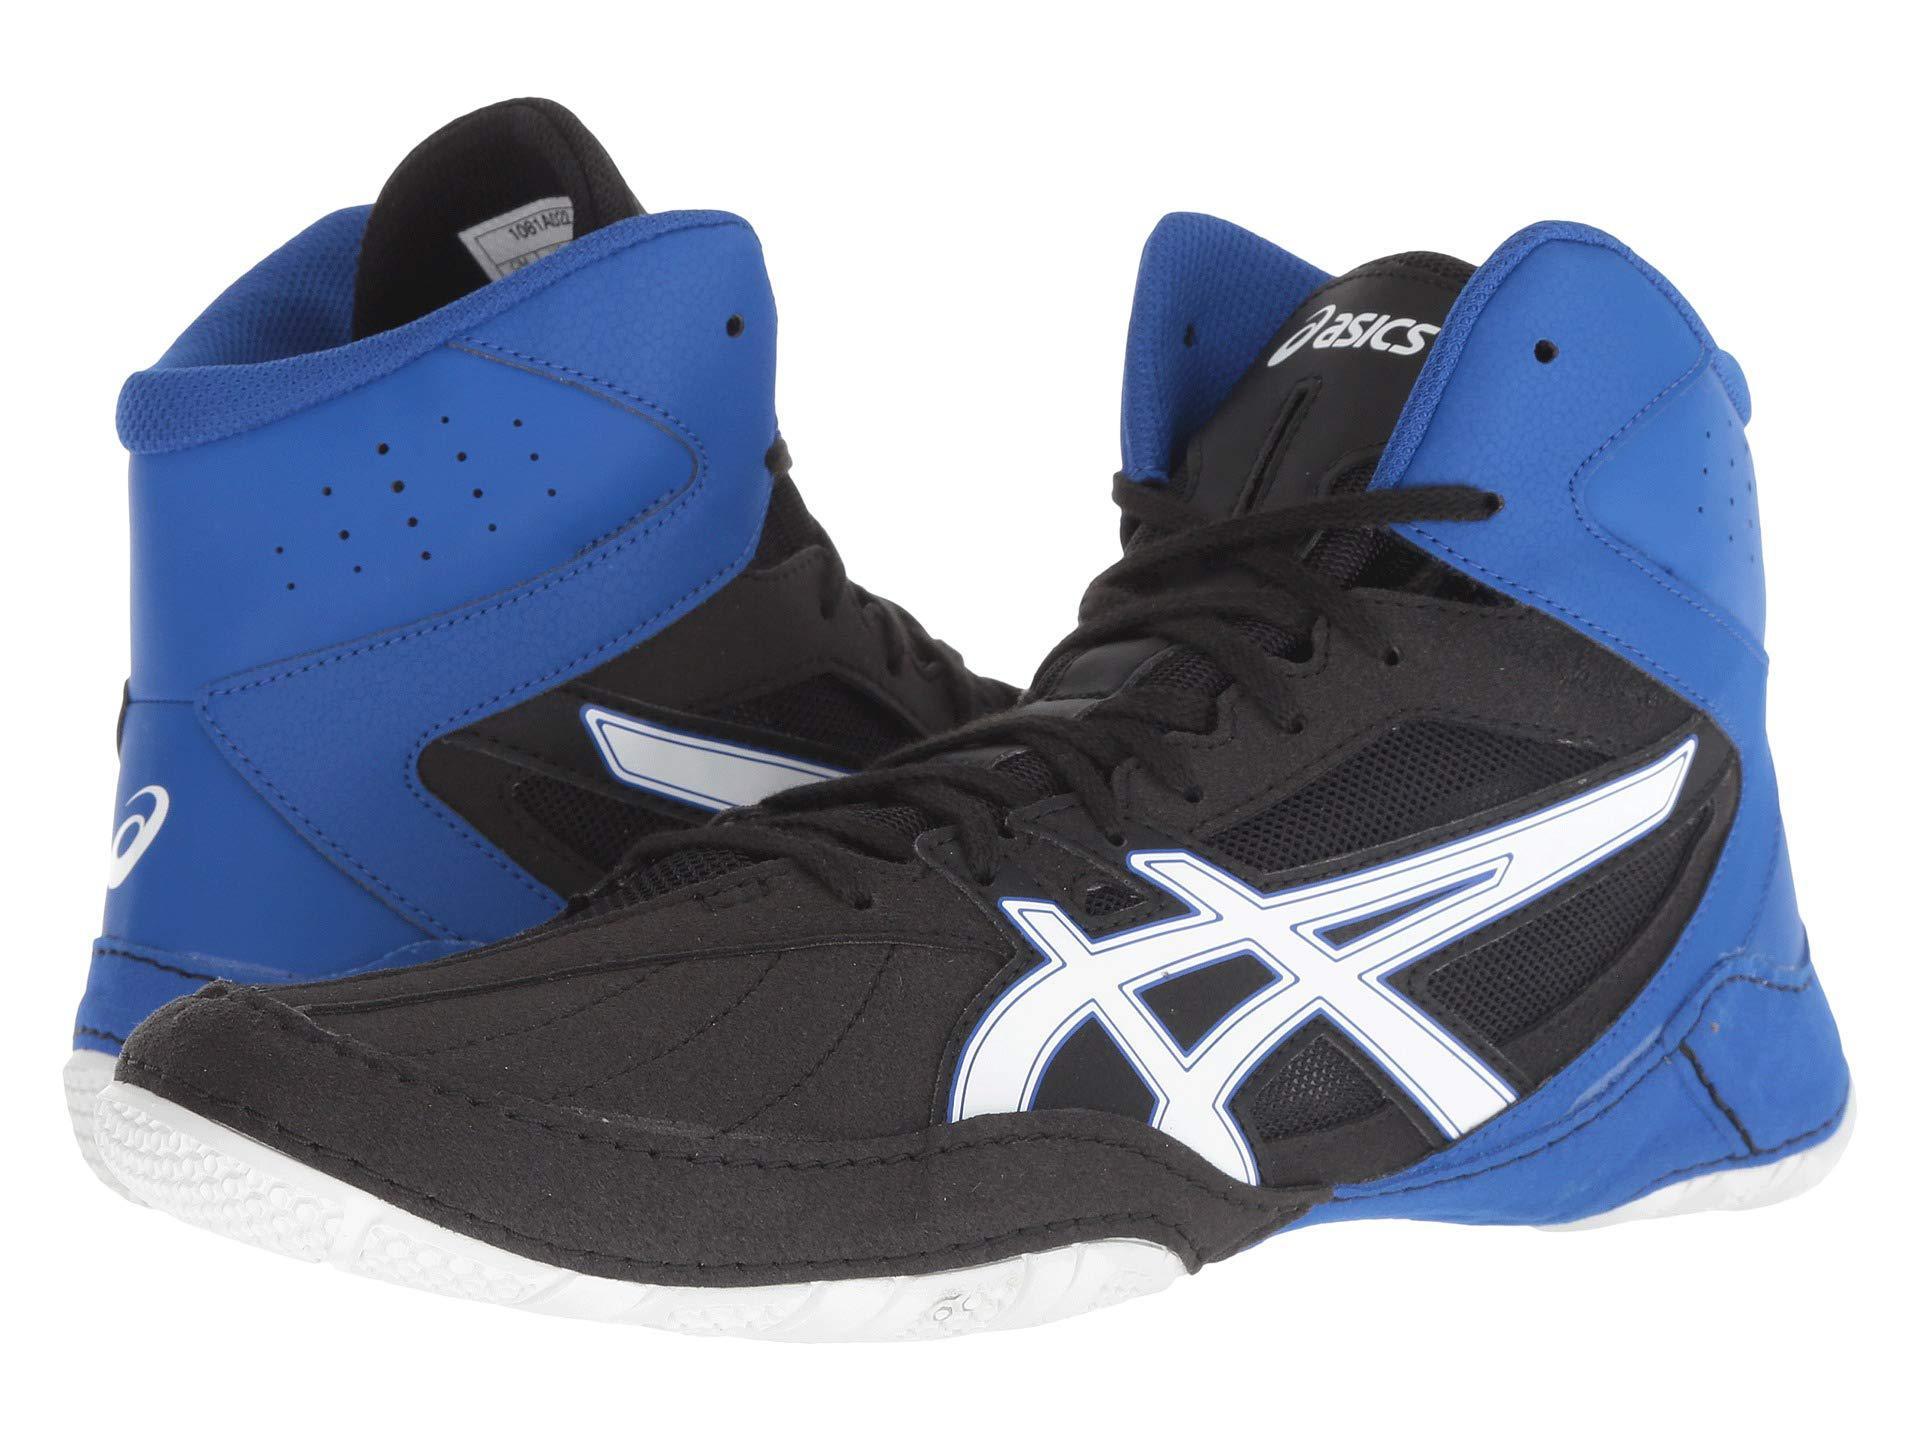 efa9deb1c90a Lyst - Asics Matcontrol (black black) Men s Wrestling Shoes for Men